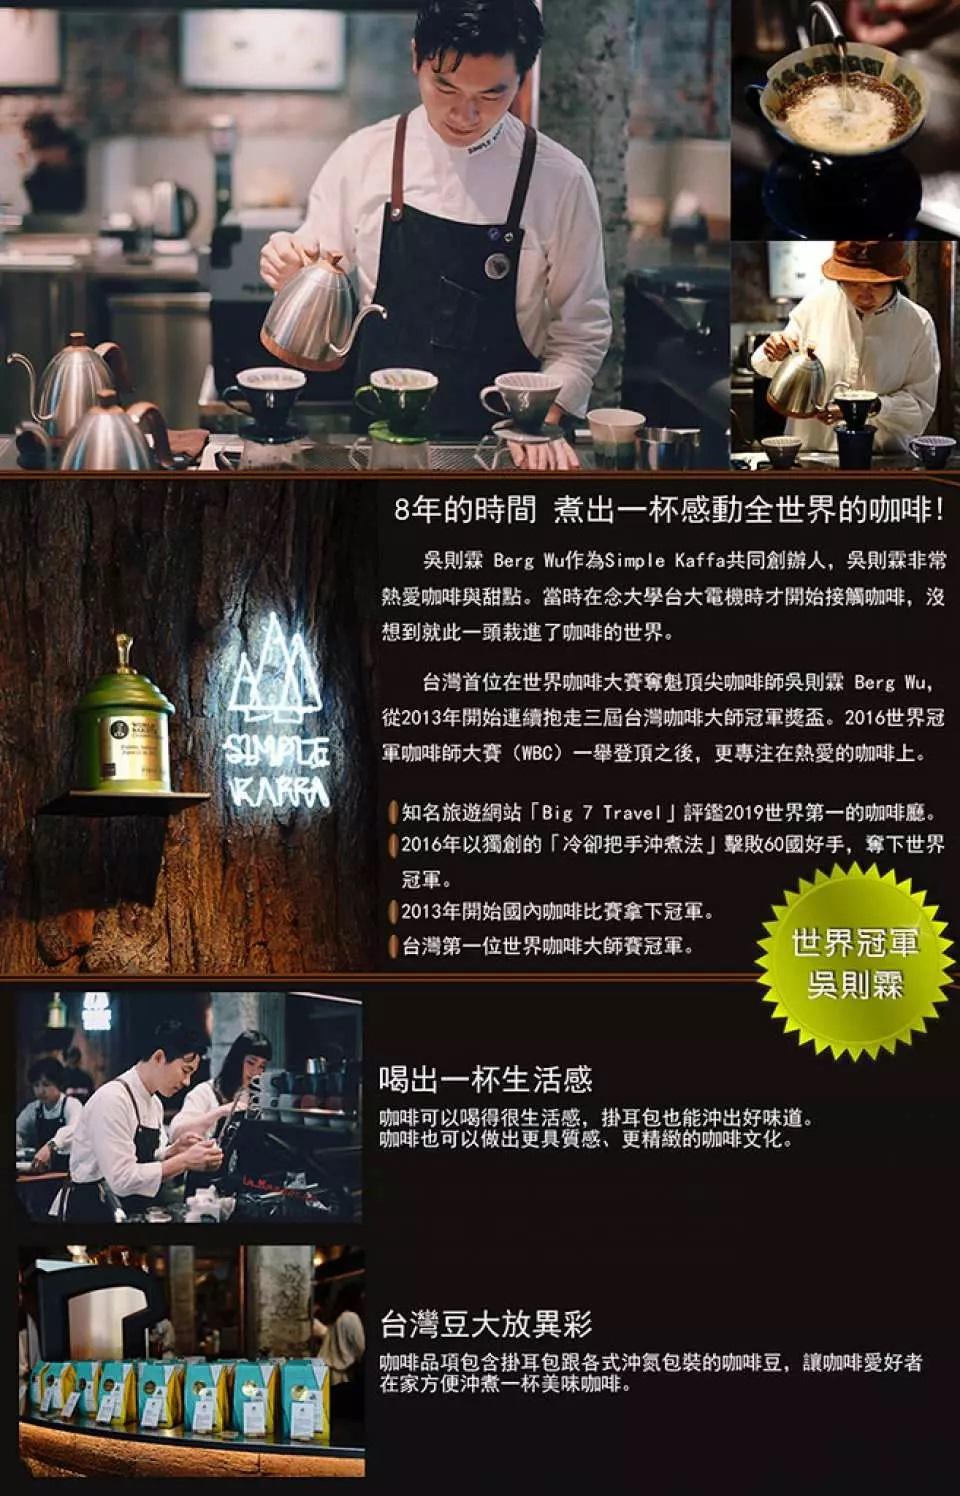 Simple Kaffa 興波咖啡旗艦店。世界冠軍濾掛式咖啡宅配到府 世界50間最棒咖啡館第一名在台北